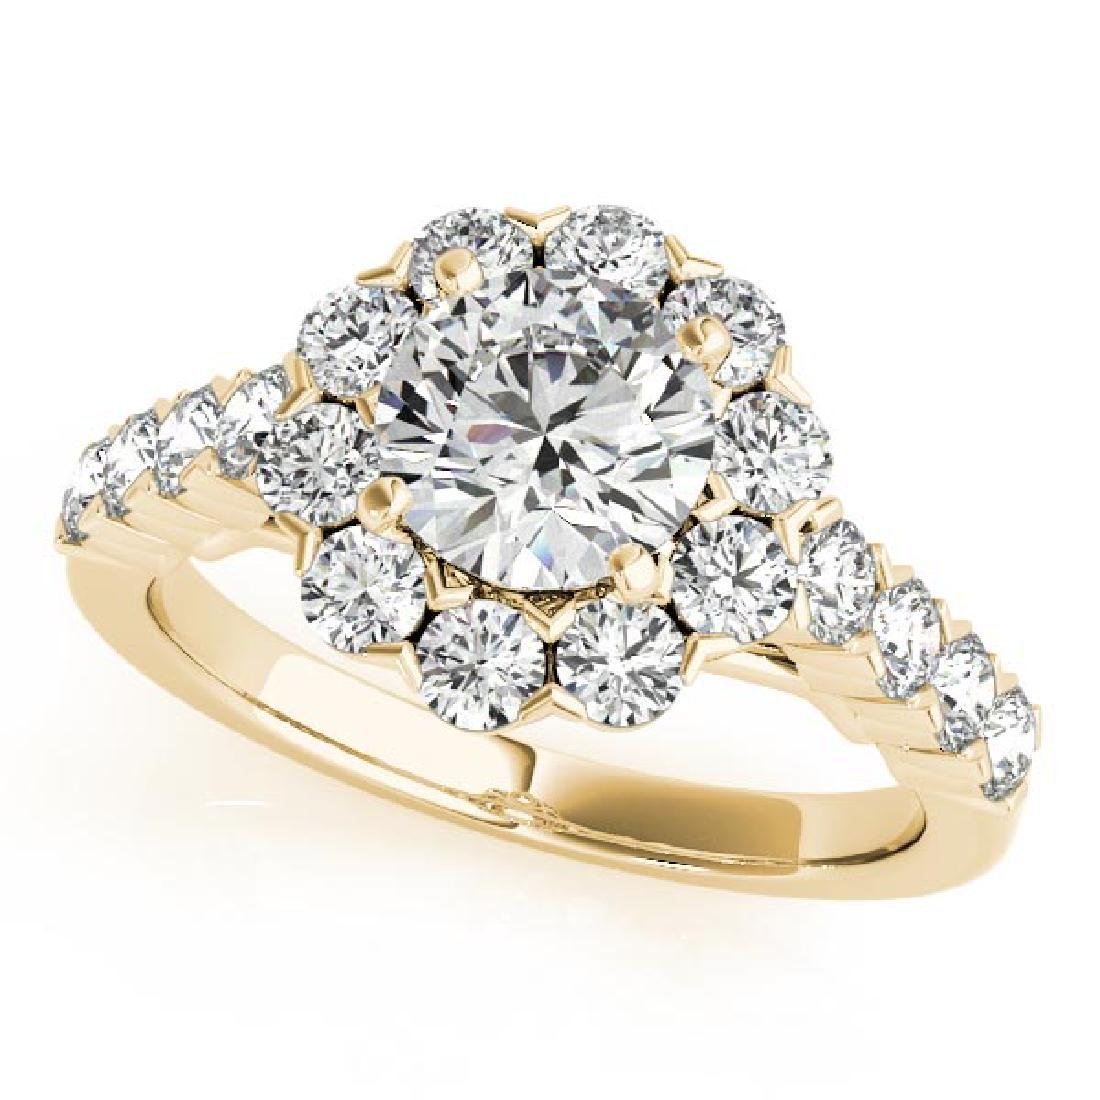 CERTIFIED 14KT WHITE GOLD 1.12 CT G-H/VS-SI1 DIAMOND HA